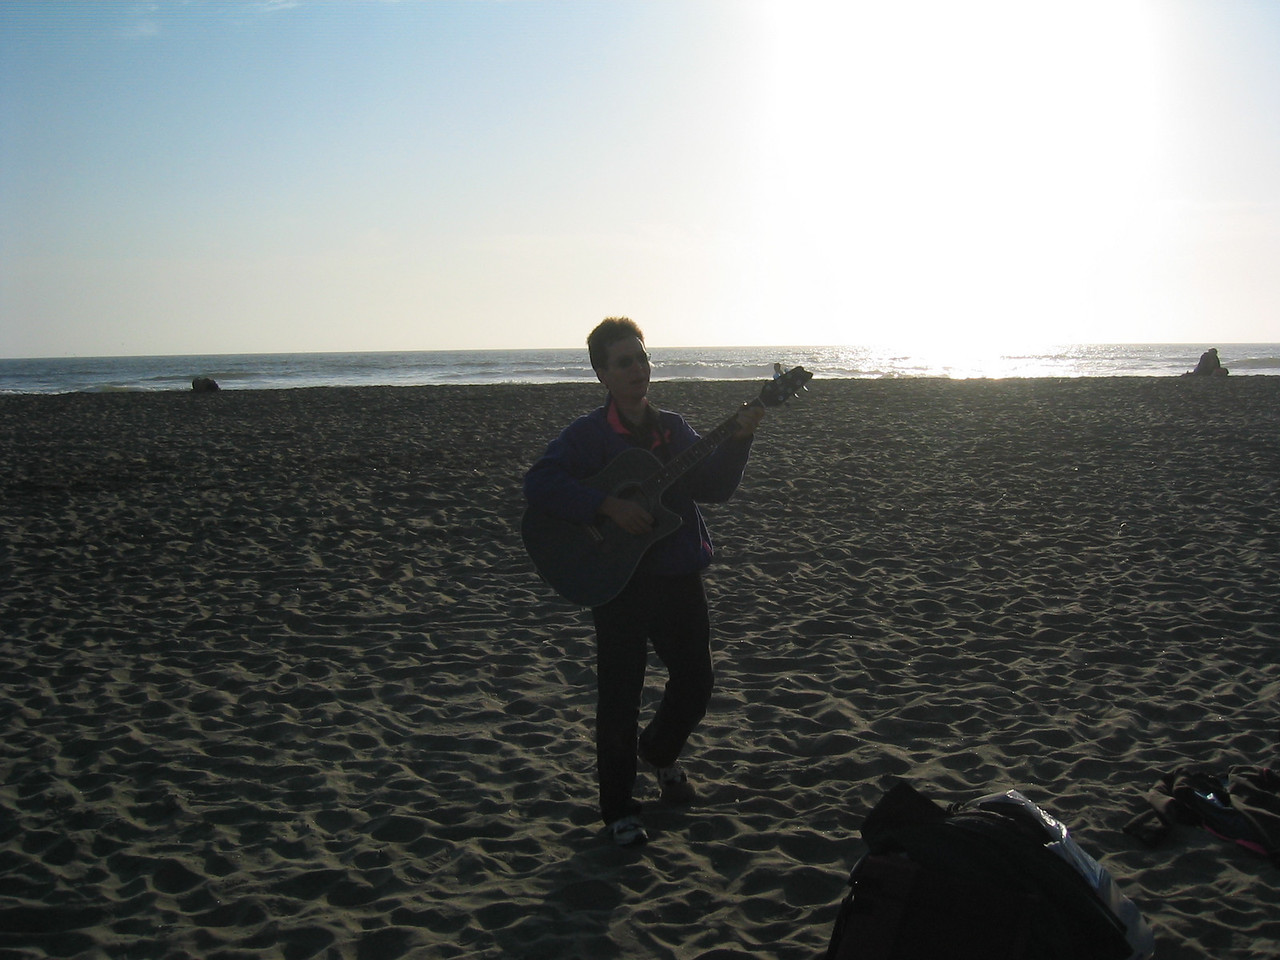 Chris roams the beach serenading